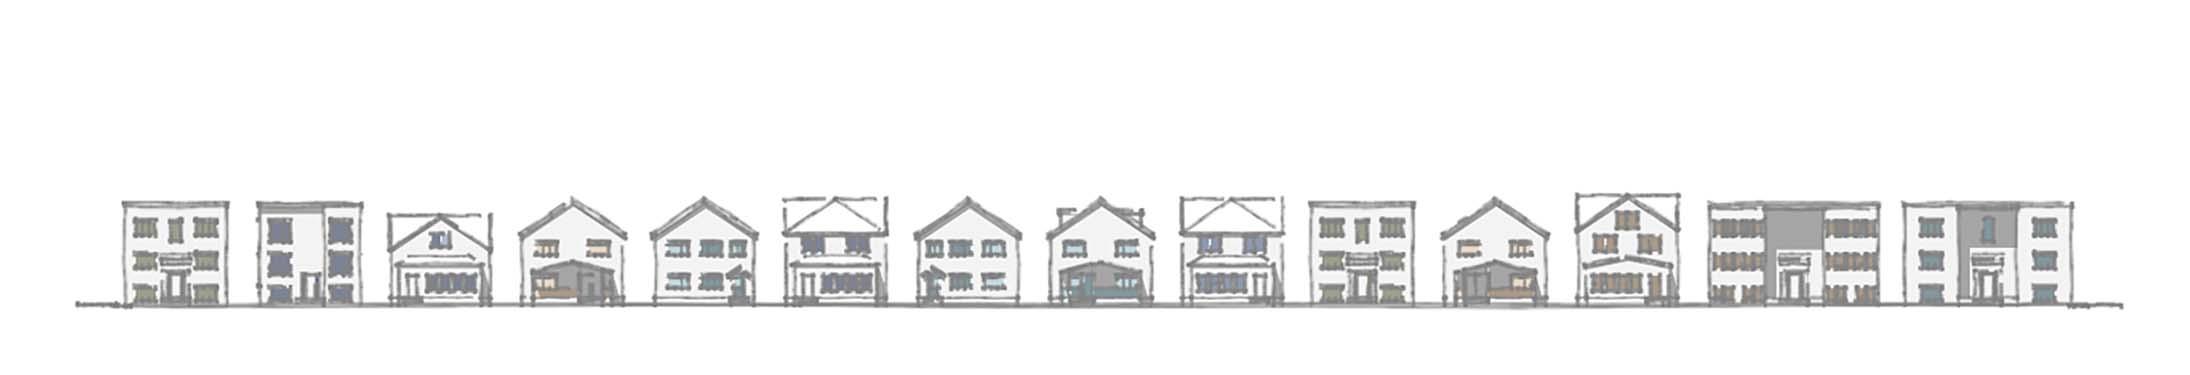 Elevation rendering of Interior 2